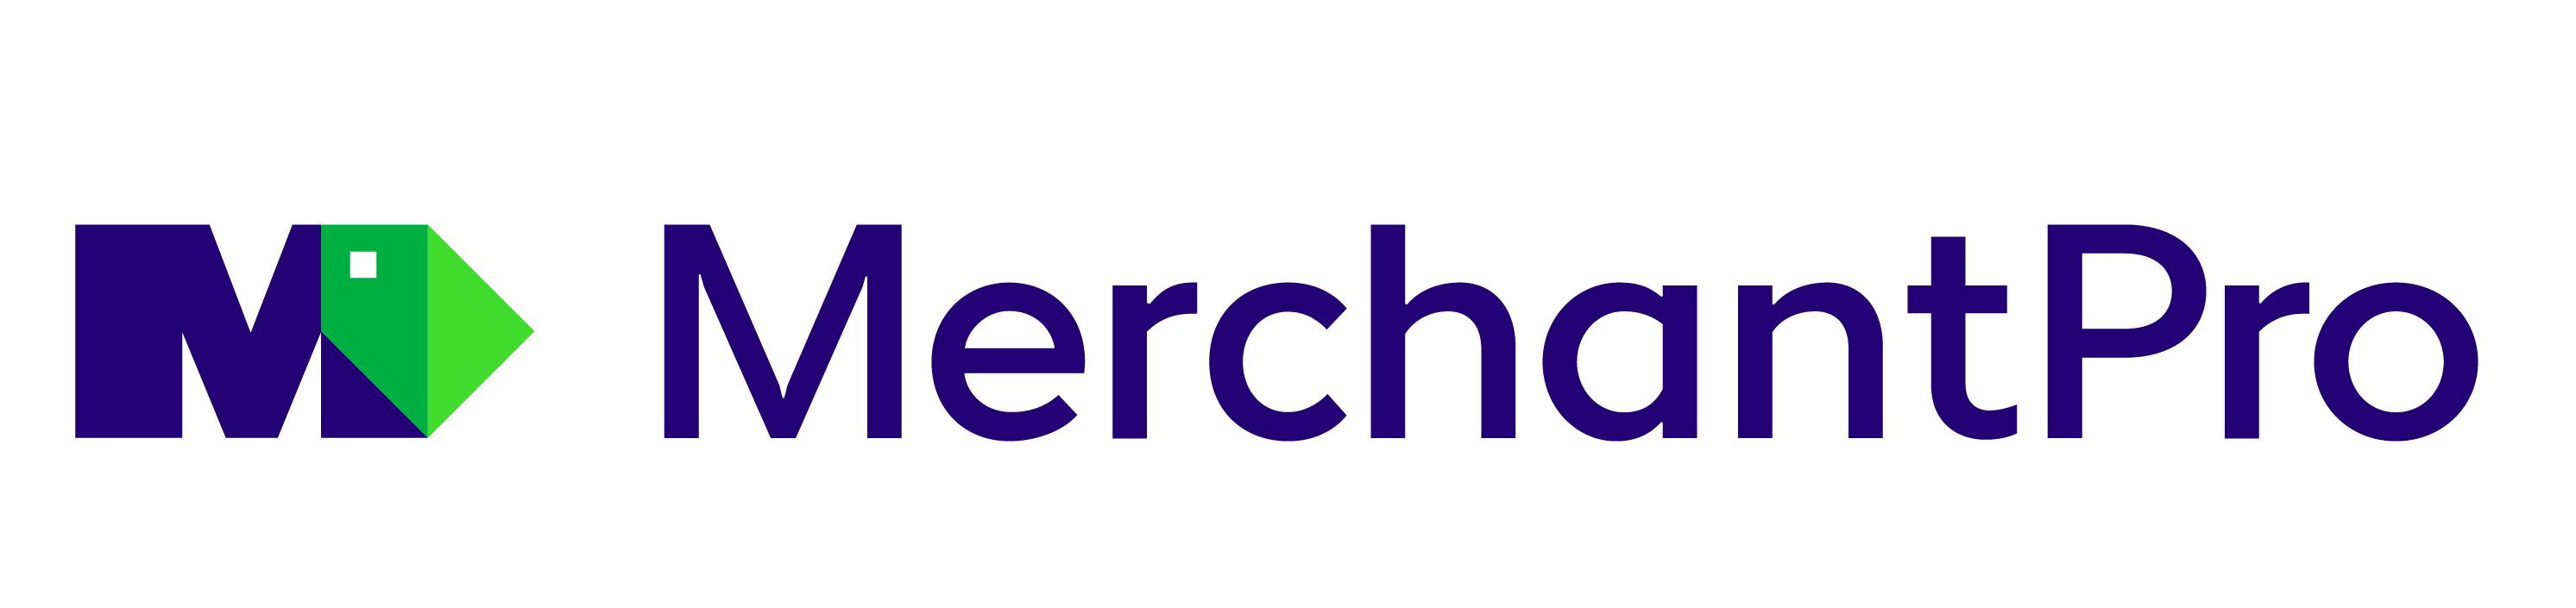 Merchant Pro